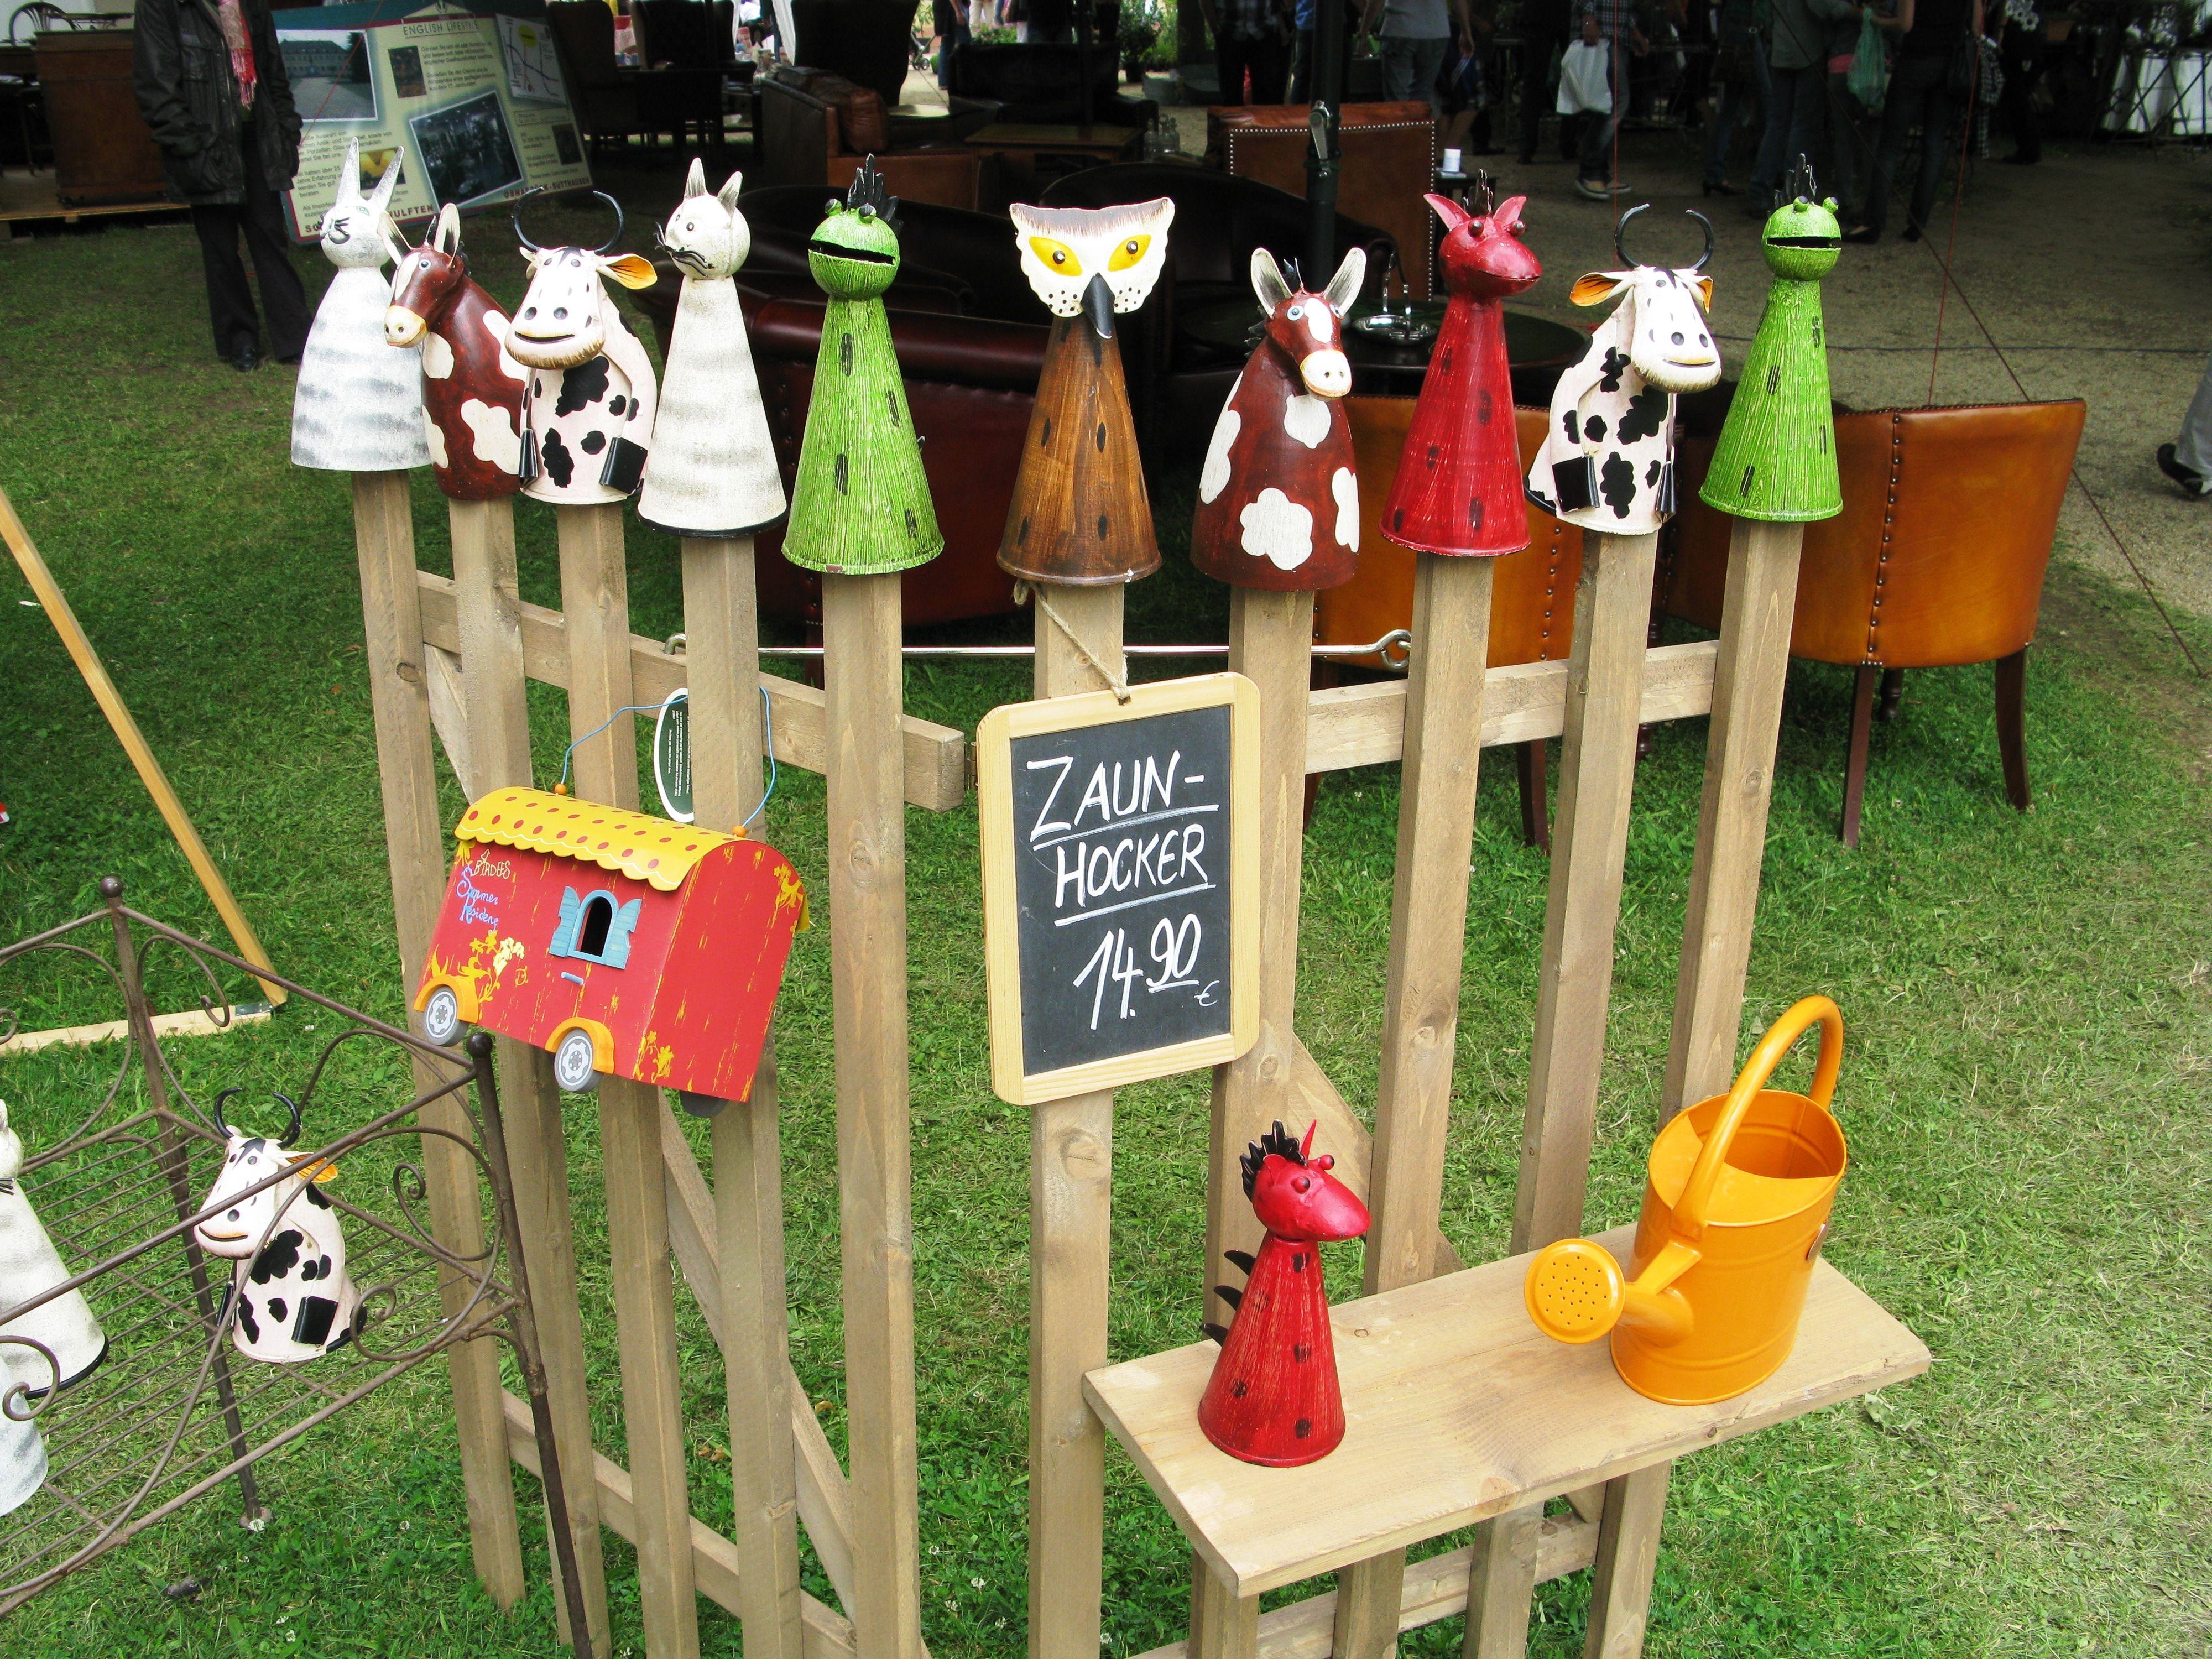 zaunhocker garden festival schloss wilhelmsbad hanau. Black Bedroom Furniture Sets. Home Design Ideas